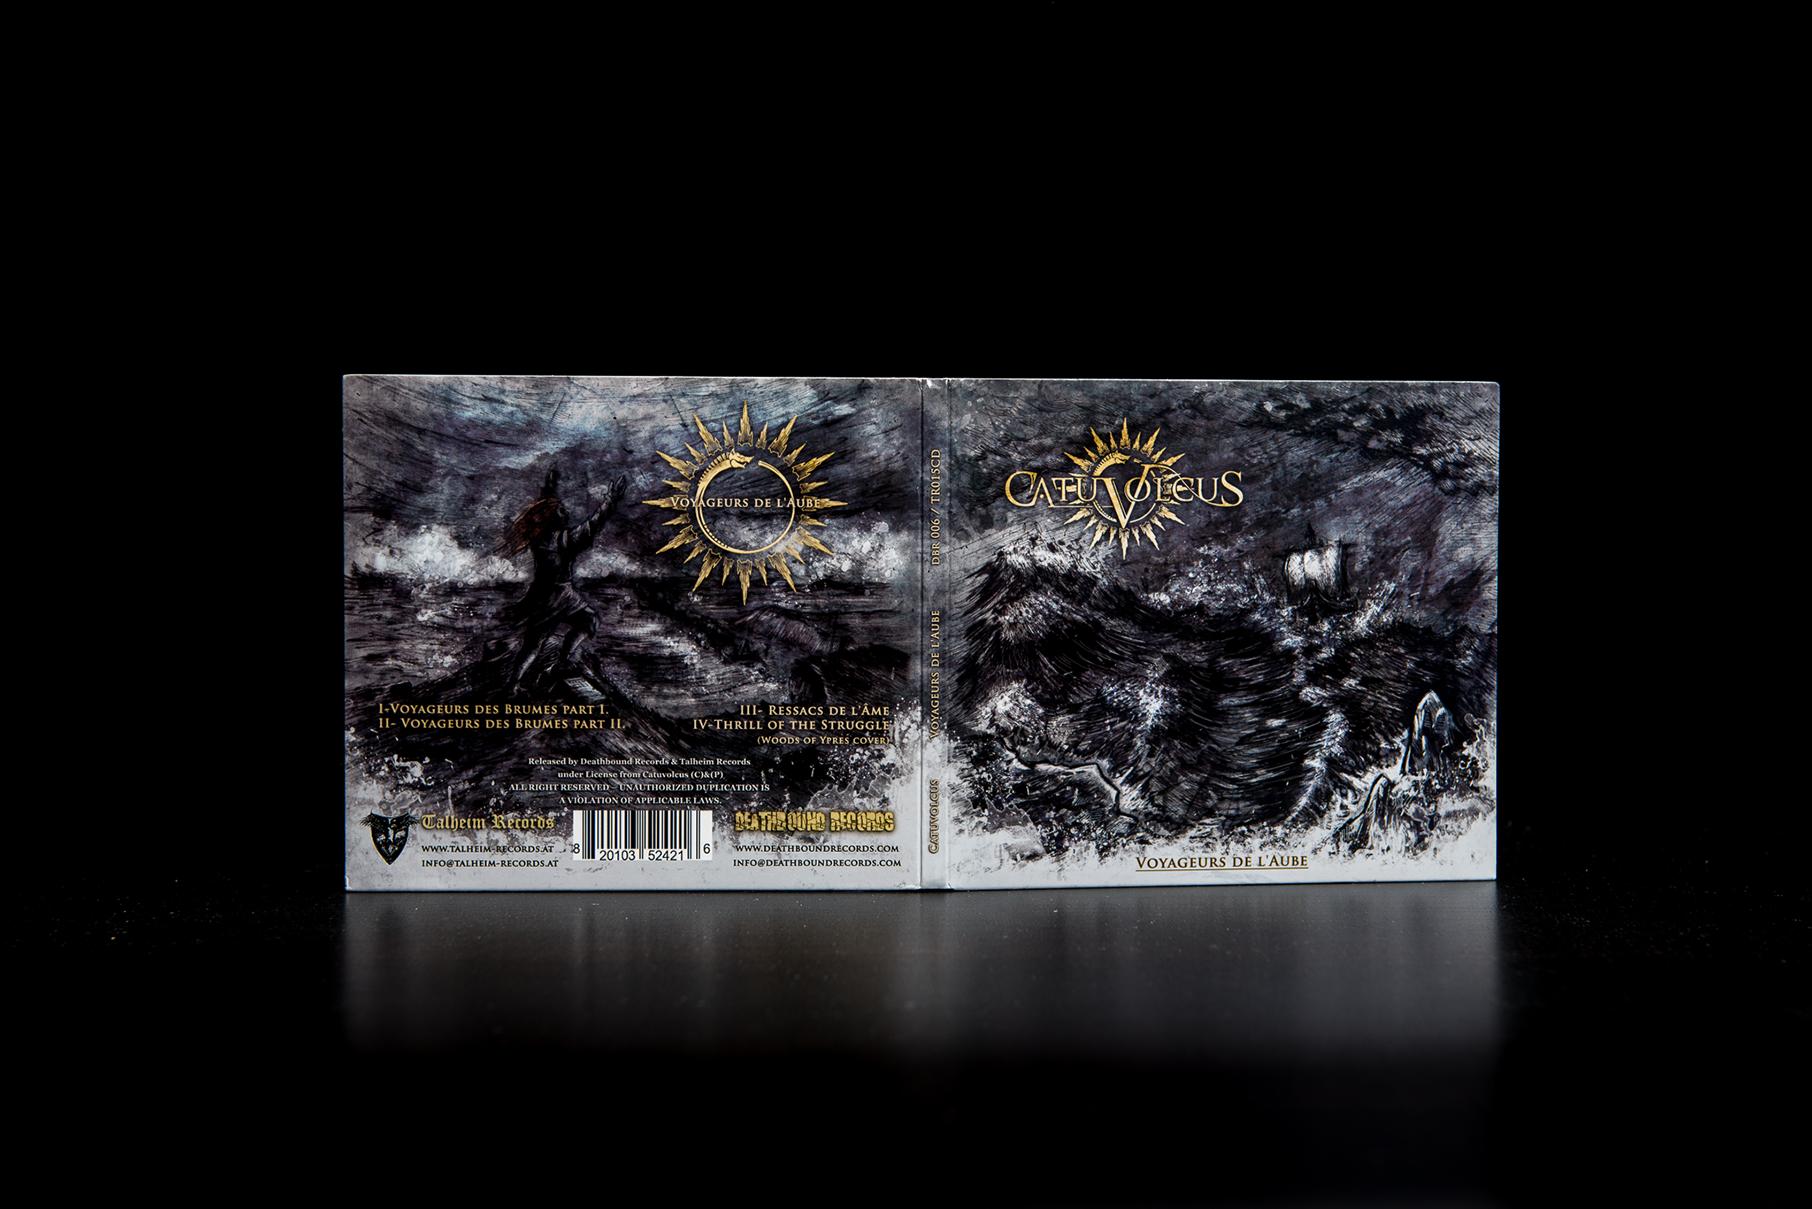 Catuvolcus - Voyageurs de l'Aube CD Digipack